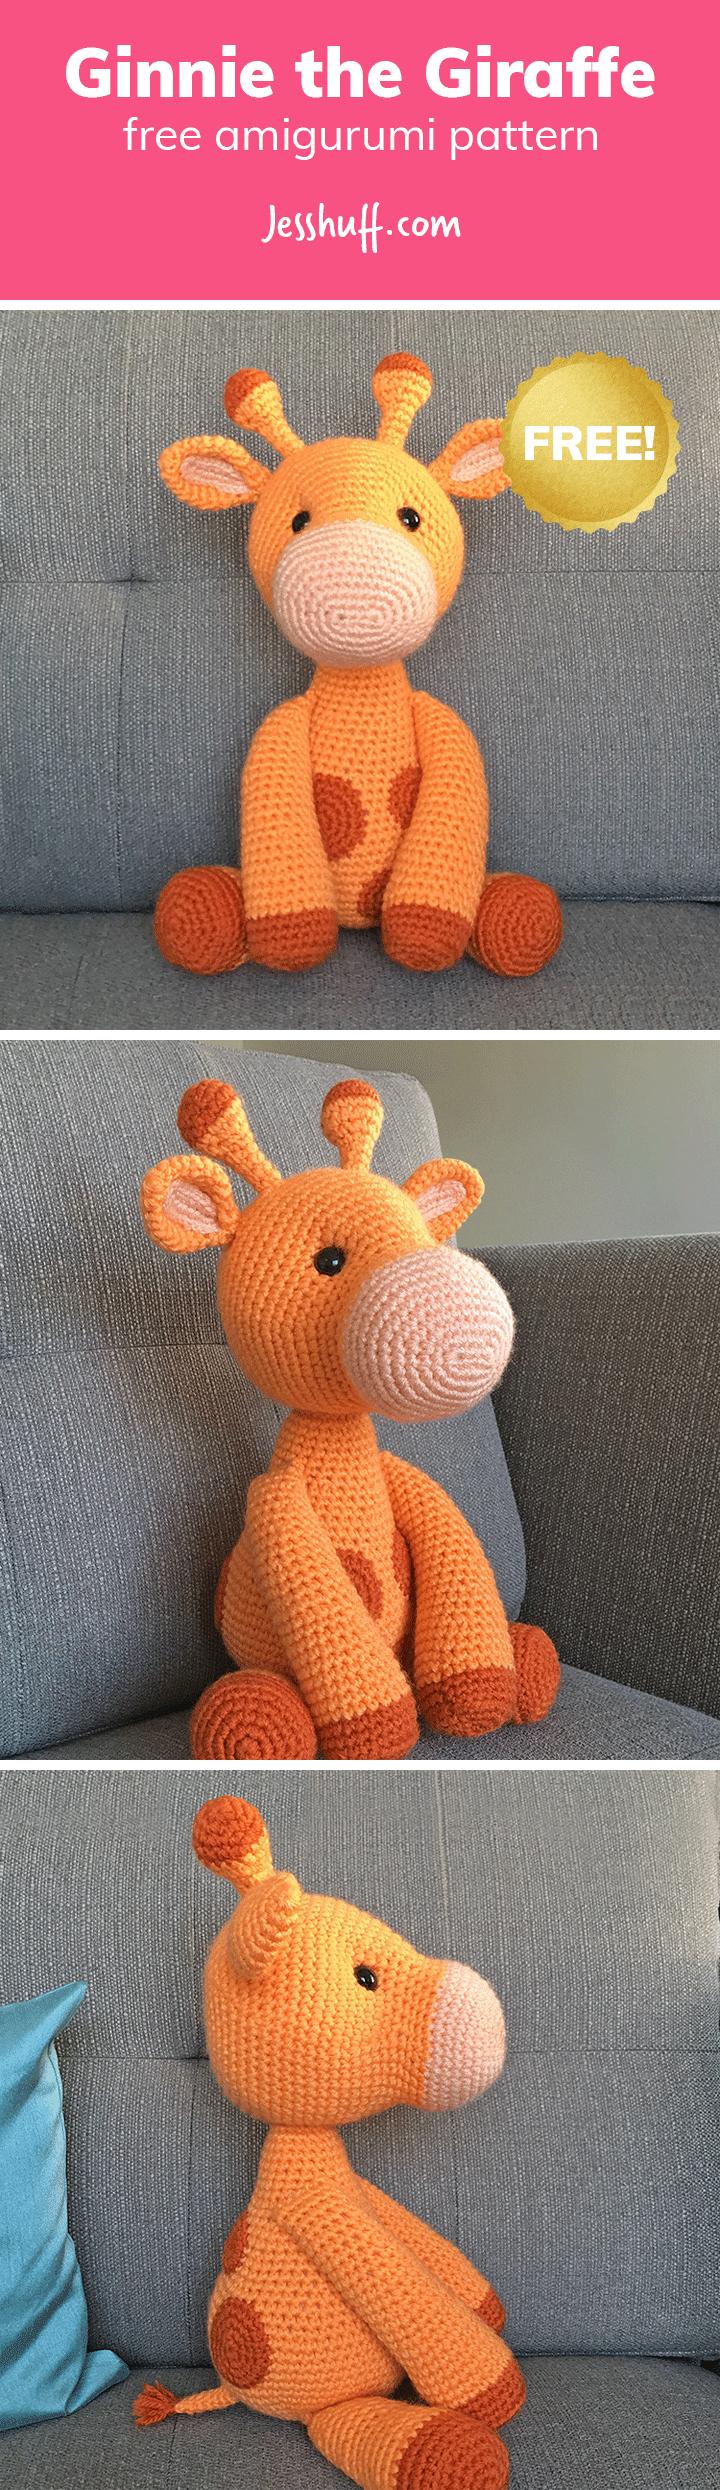 Ginnie the Giraffe Free Amigurumi Pattern | giraffes | Pinterest ...